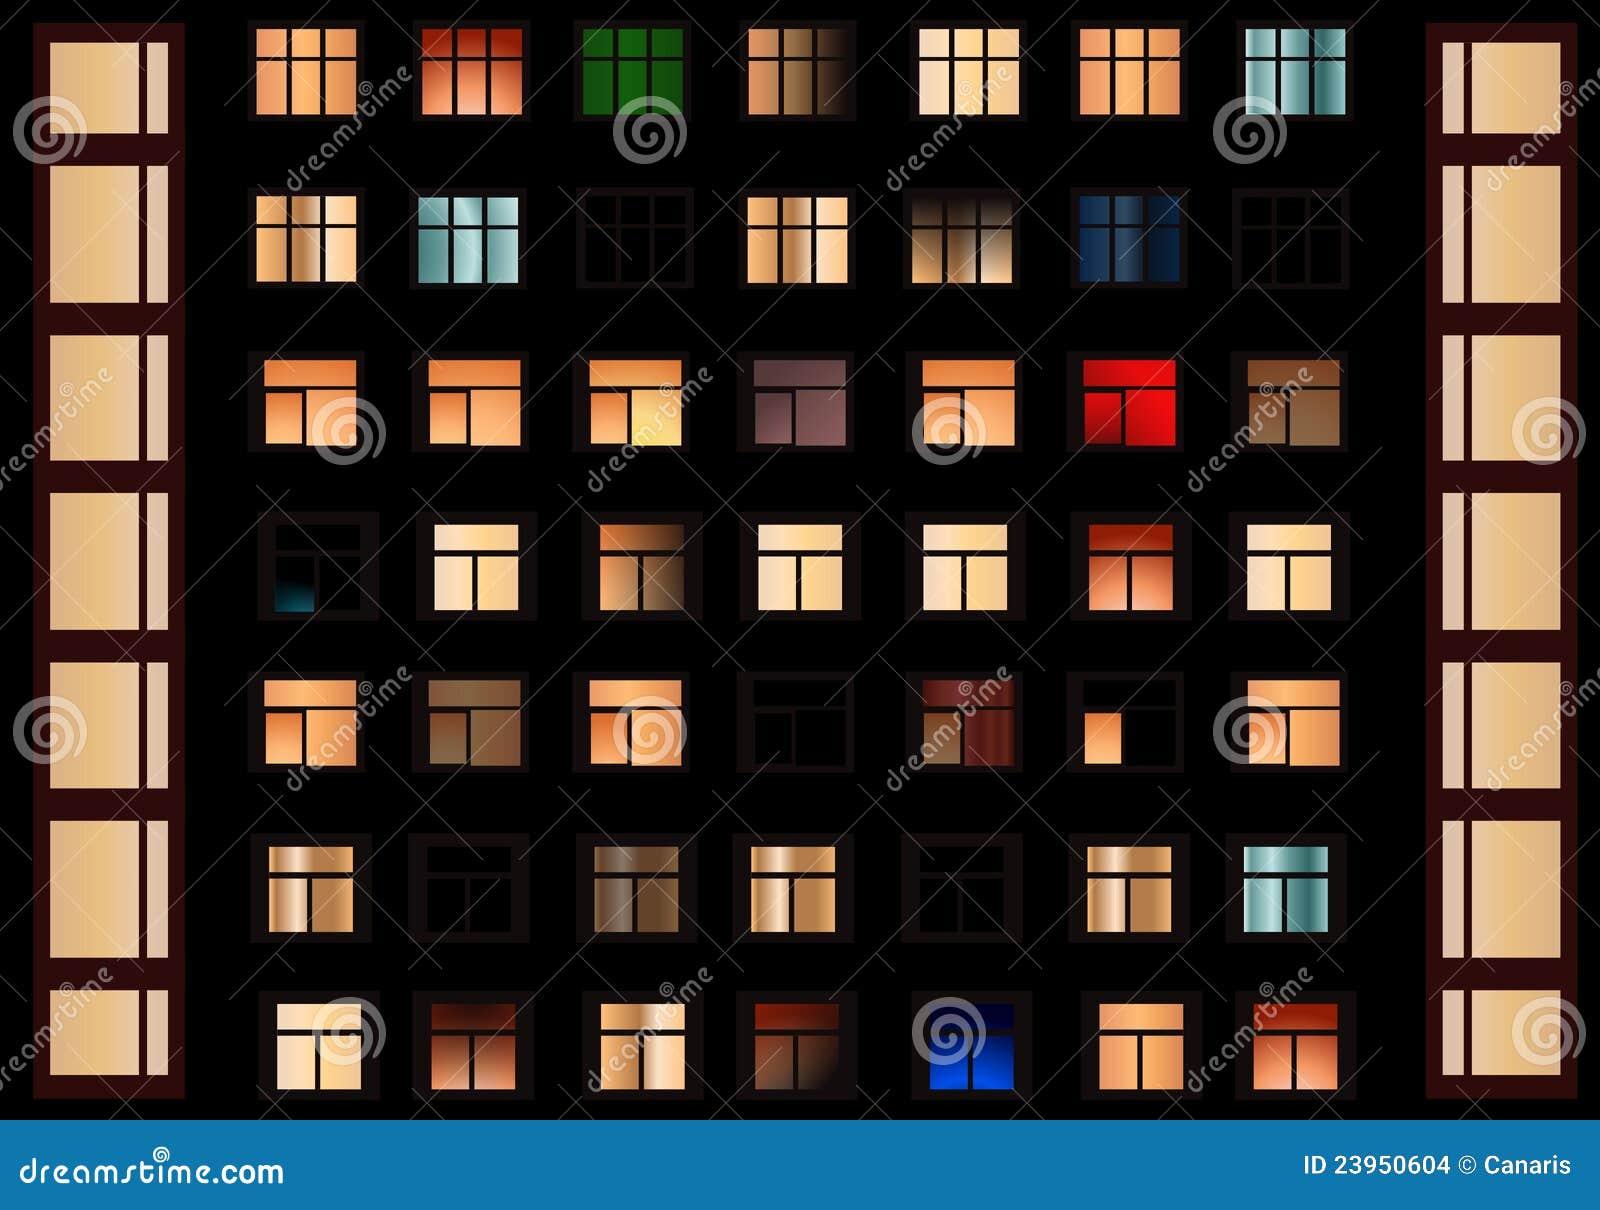 Night Windows Royalty Free Stock Photo - Image: 10600355